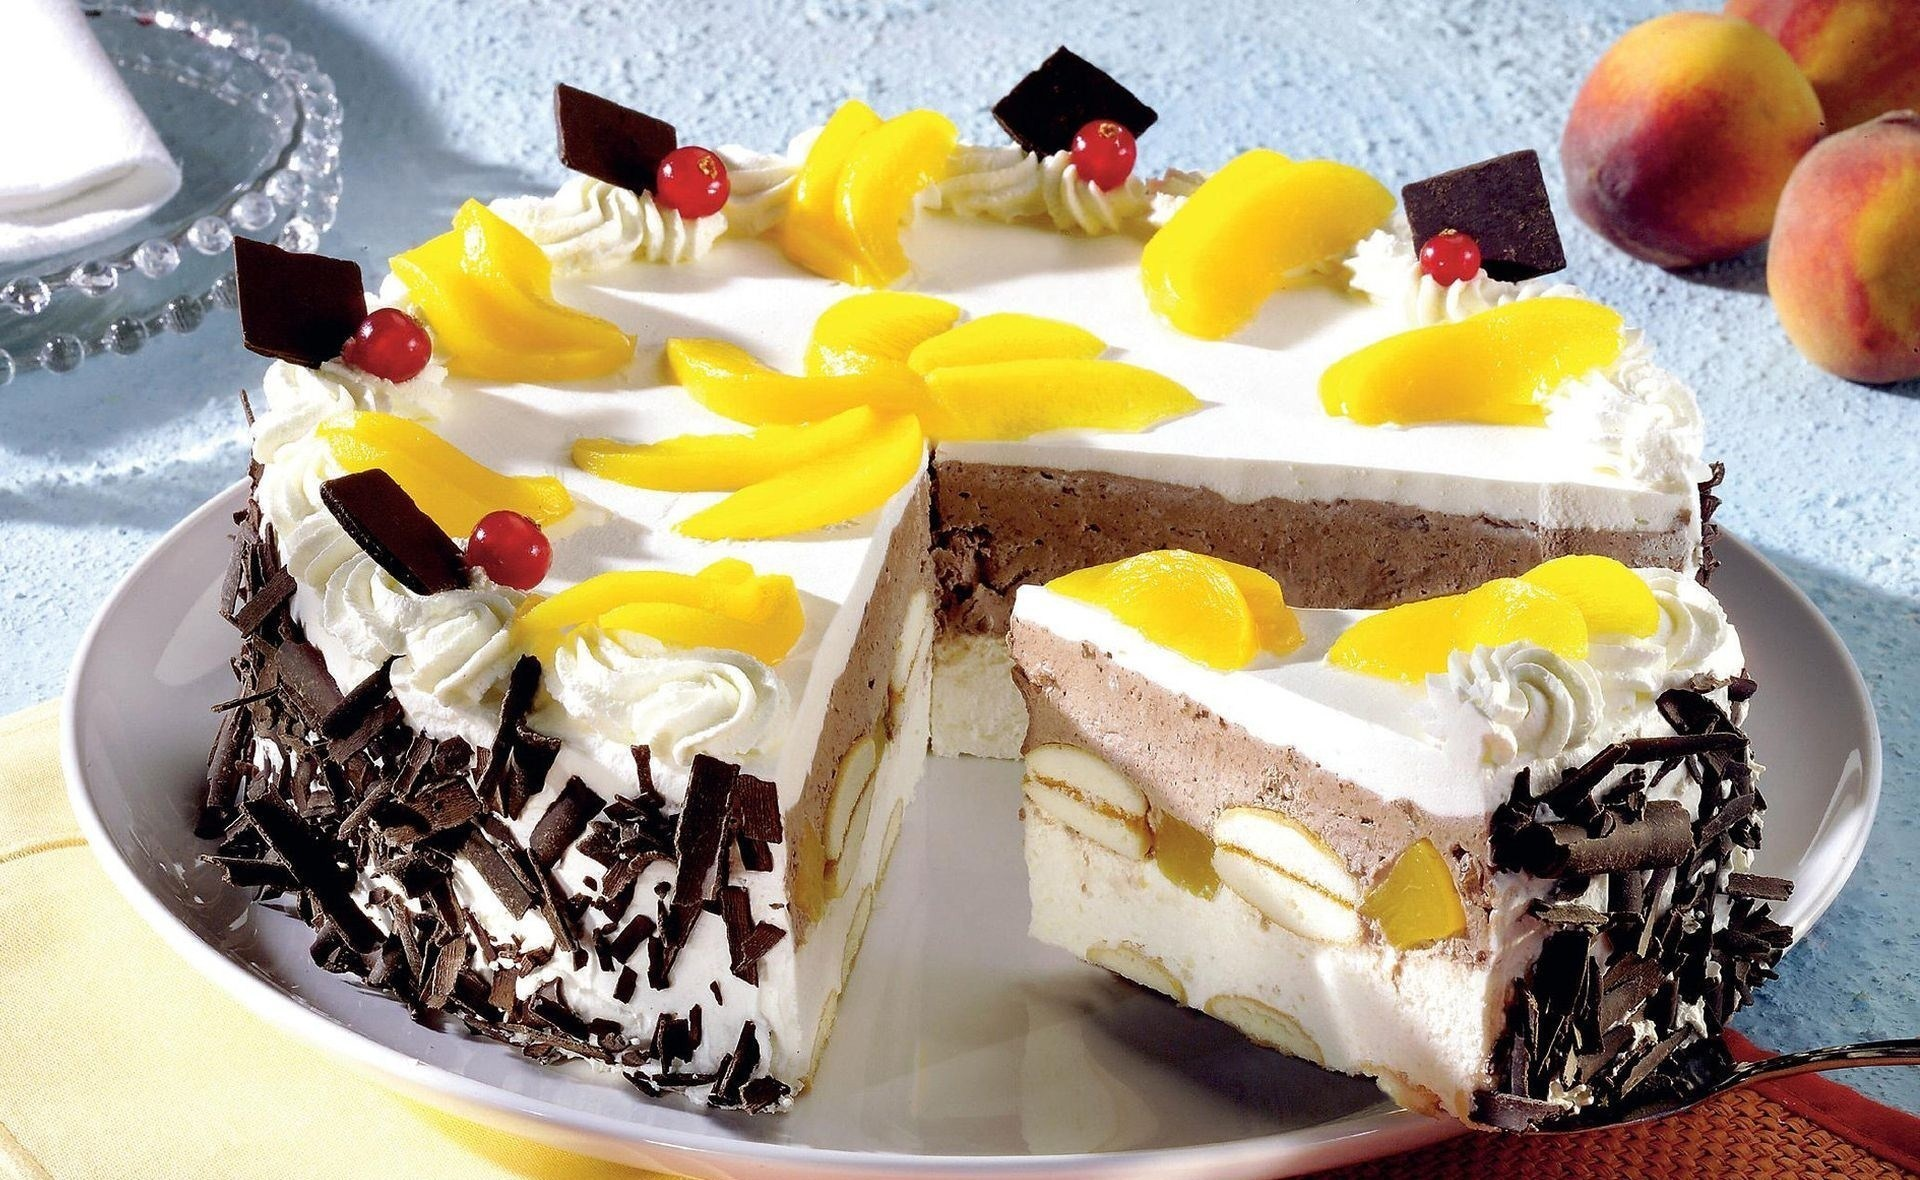 еда торт фрукты без смс